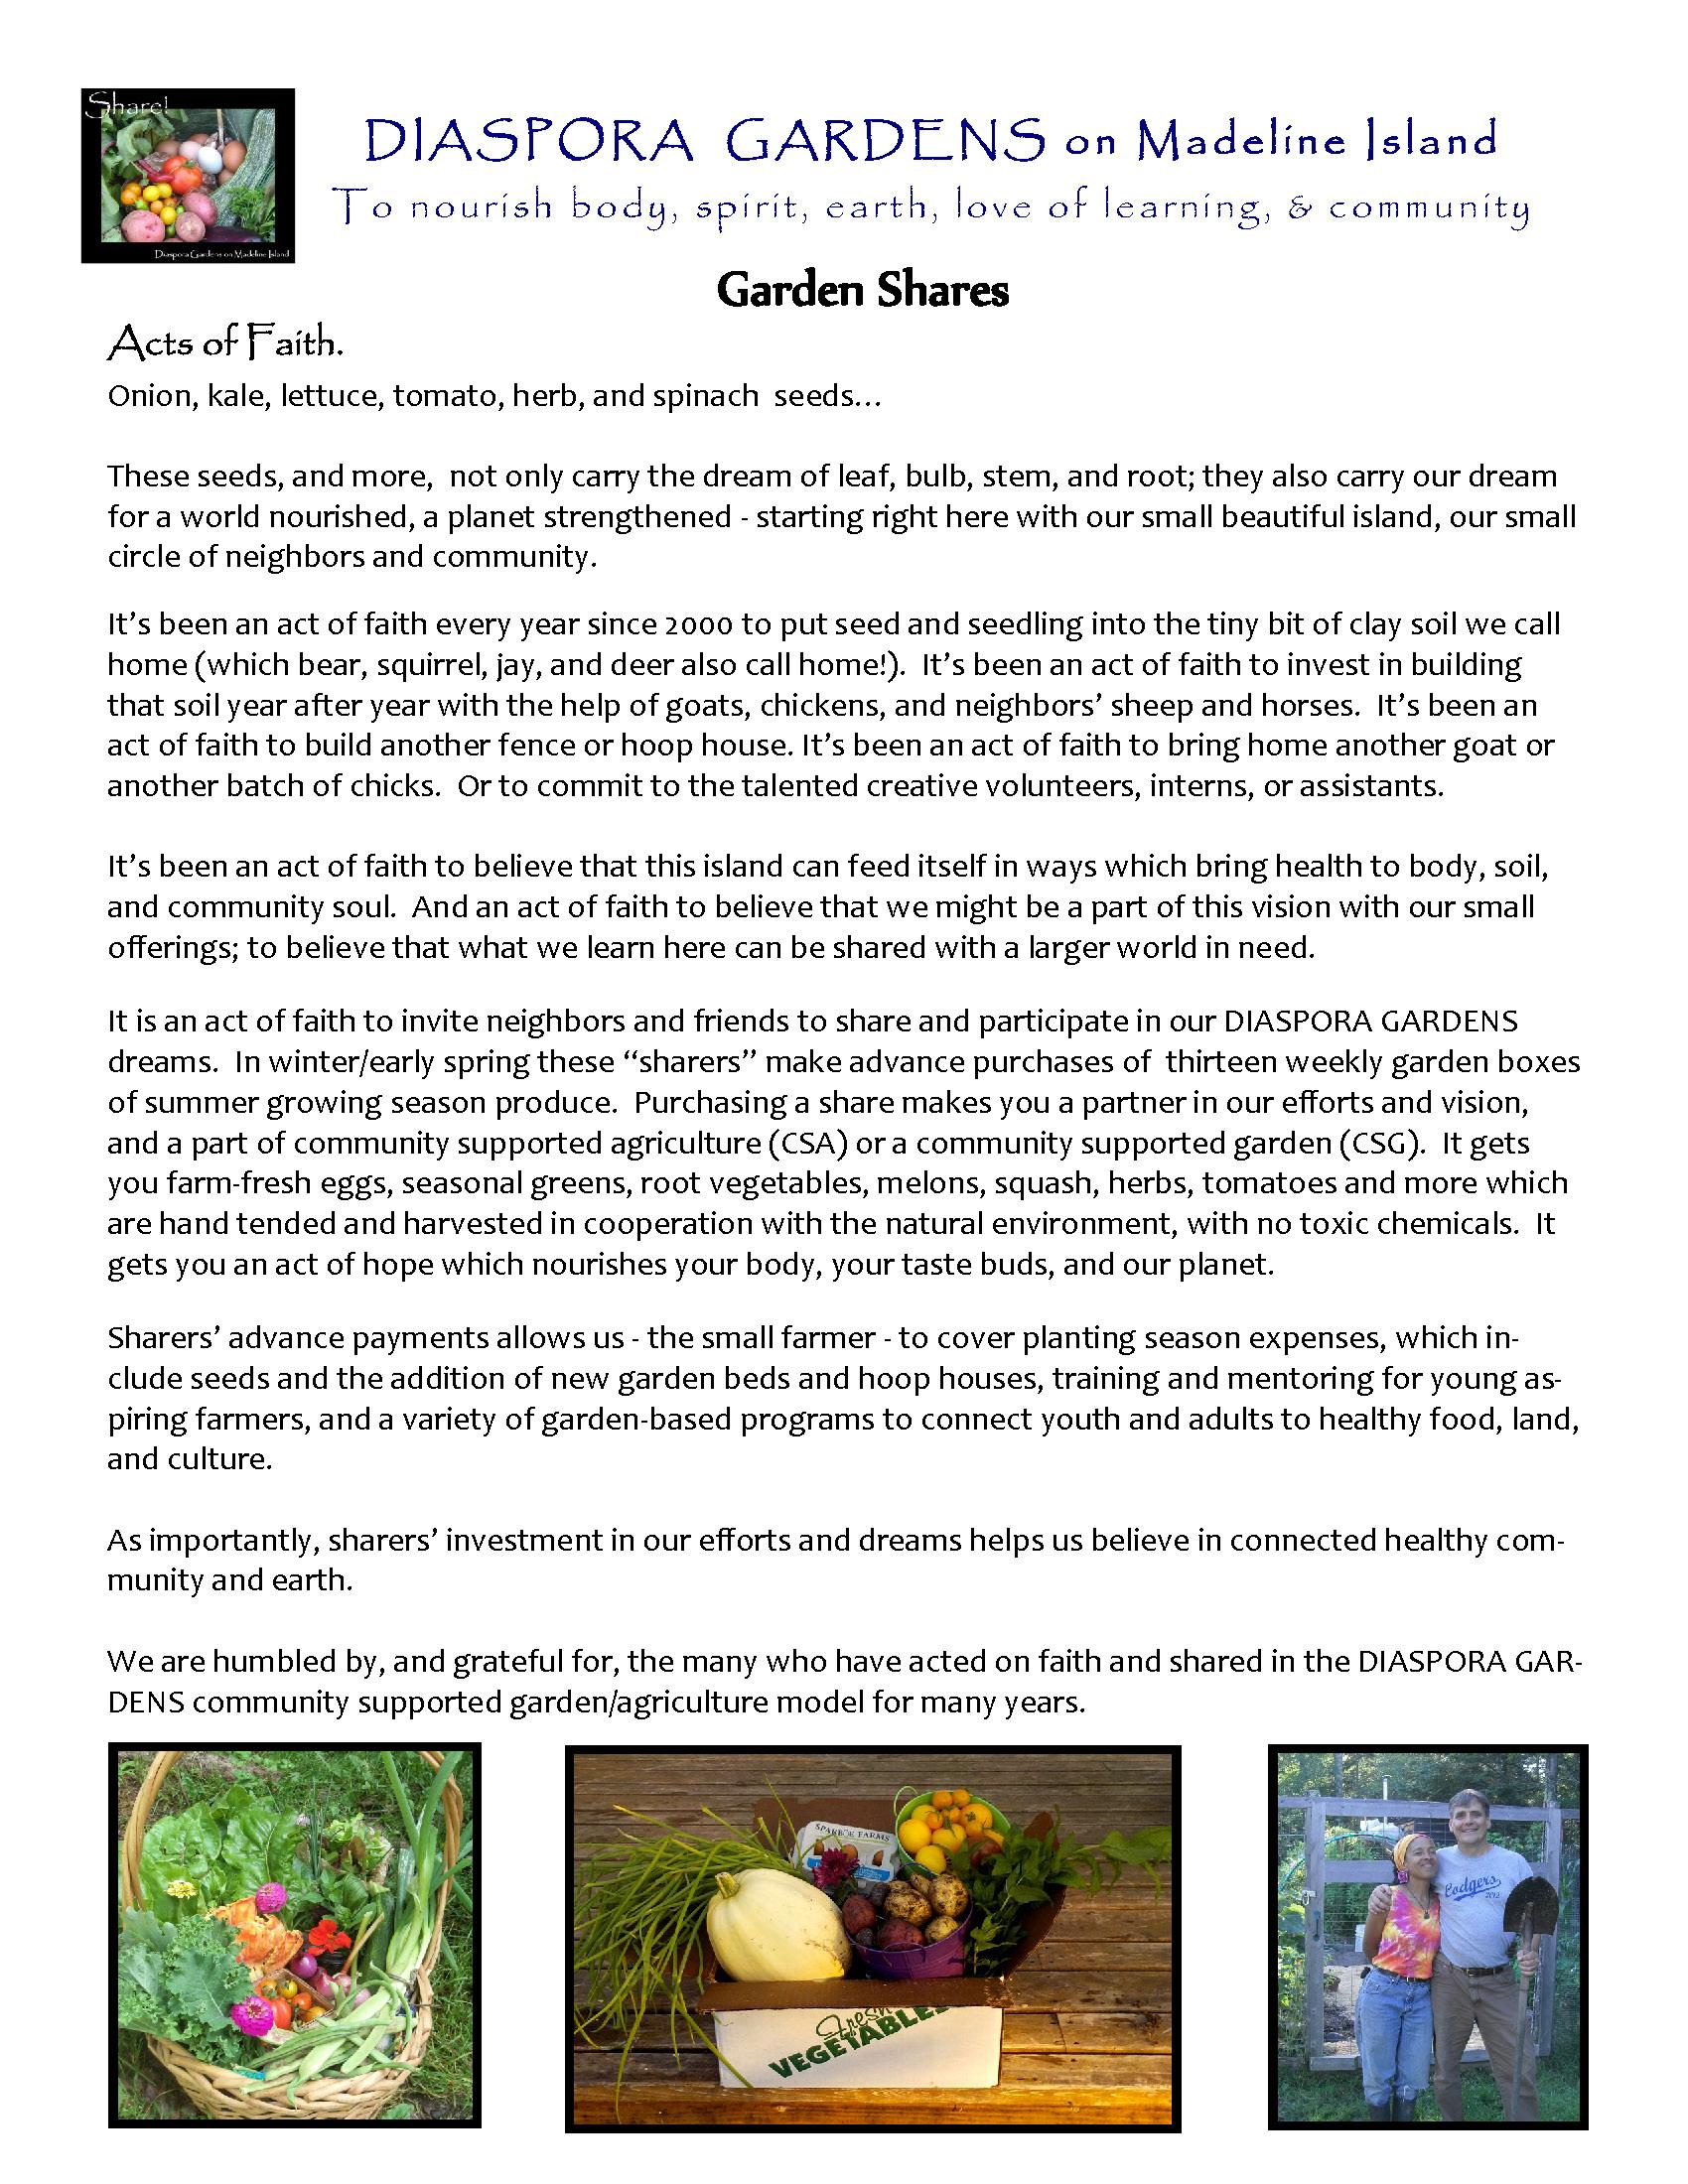 Garden Share description.jpg